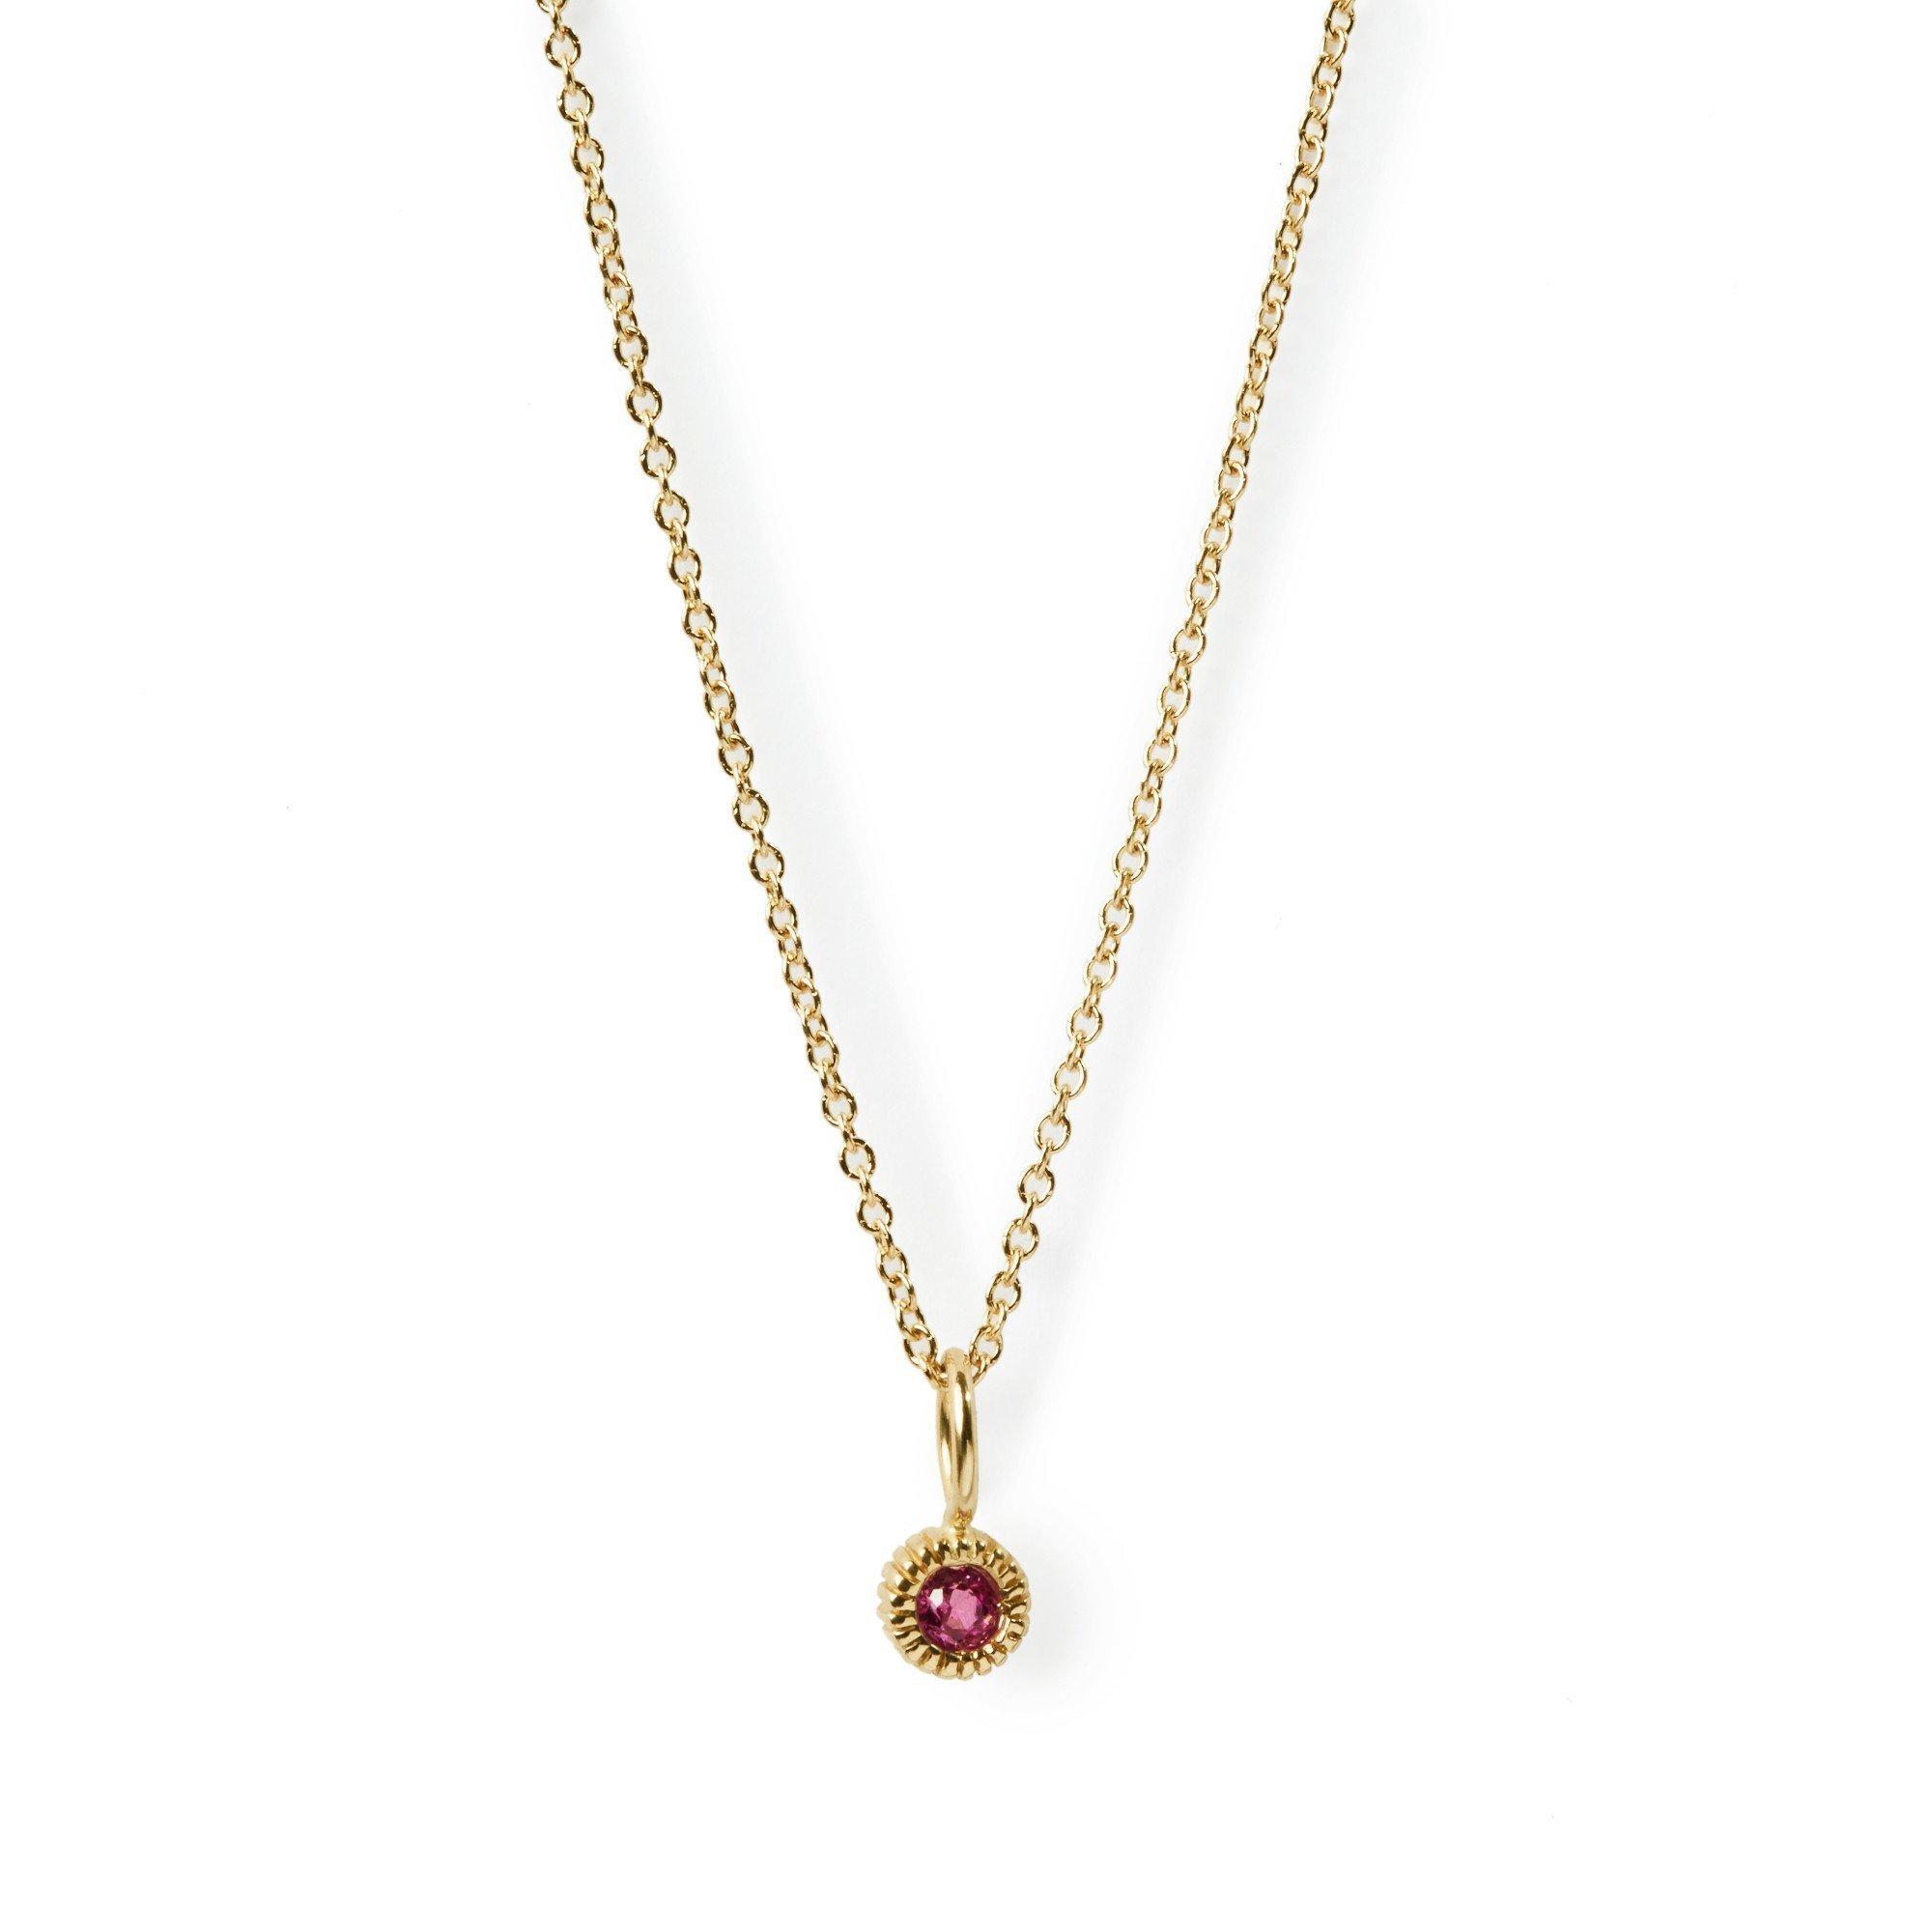 Elizabeth Buenaventura - Youth Pink Tourmaline Necklace